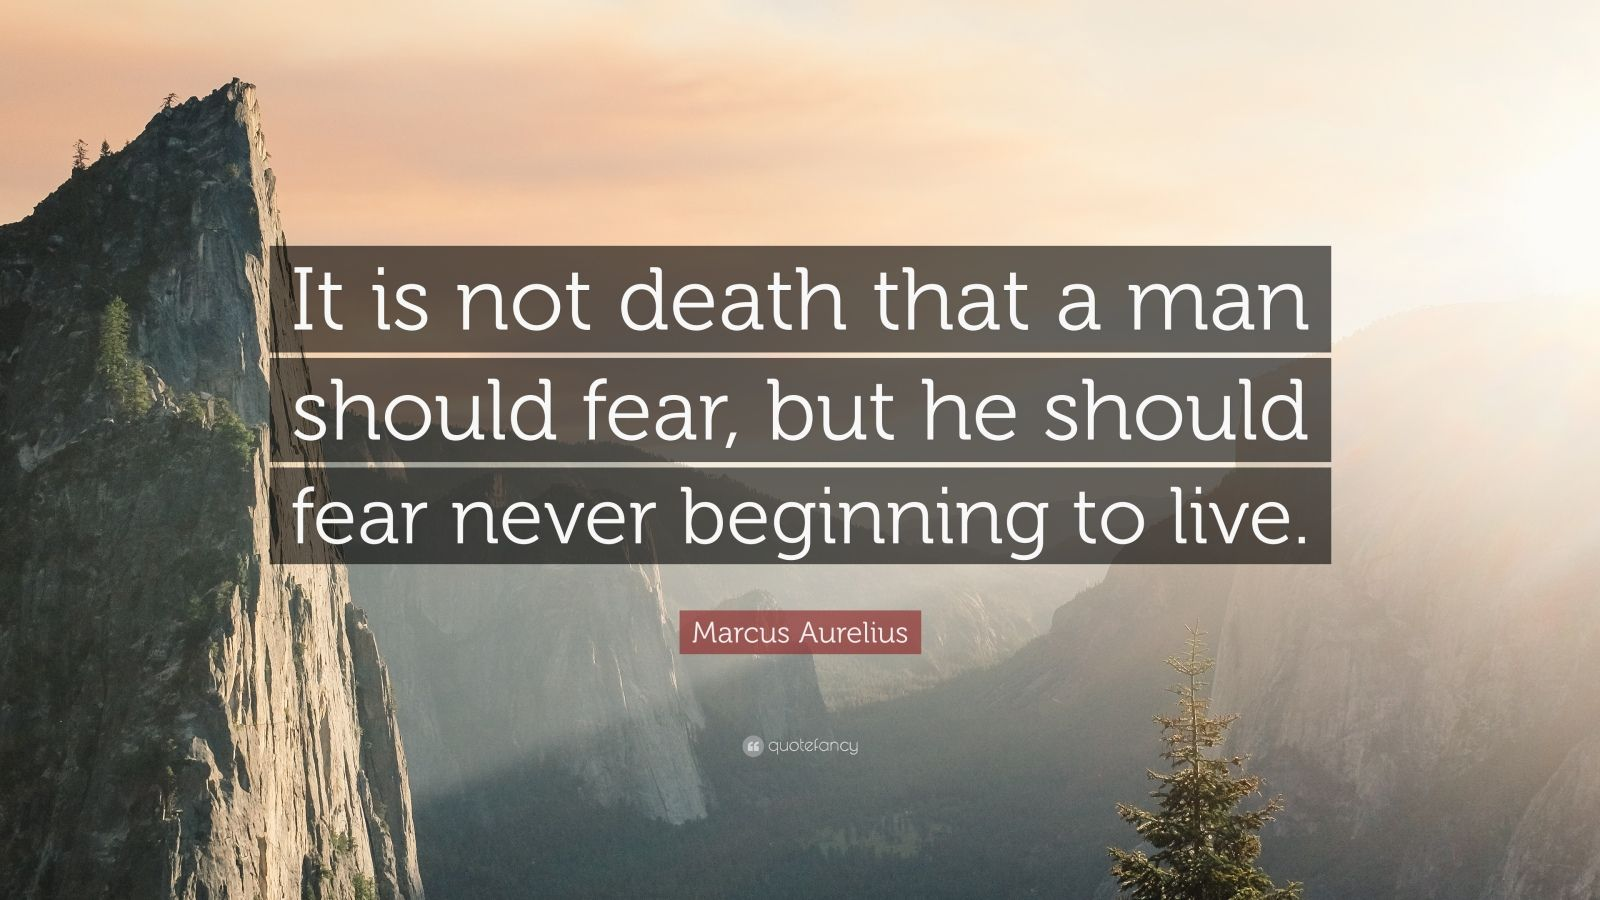 Marcus Aurelius a Man Should Not Fear Death